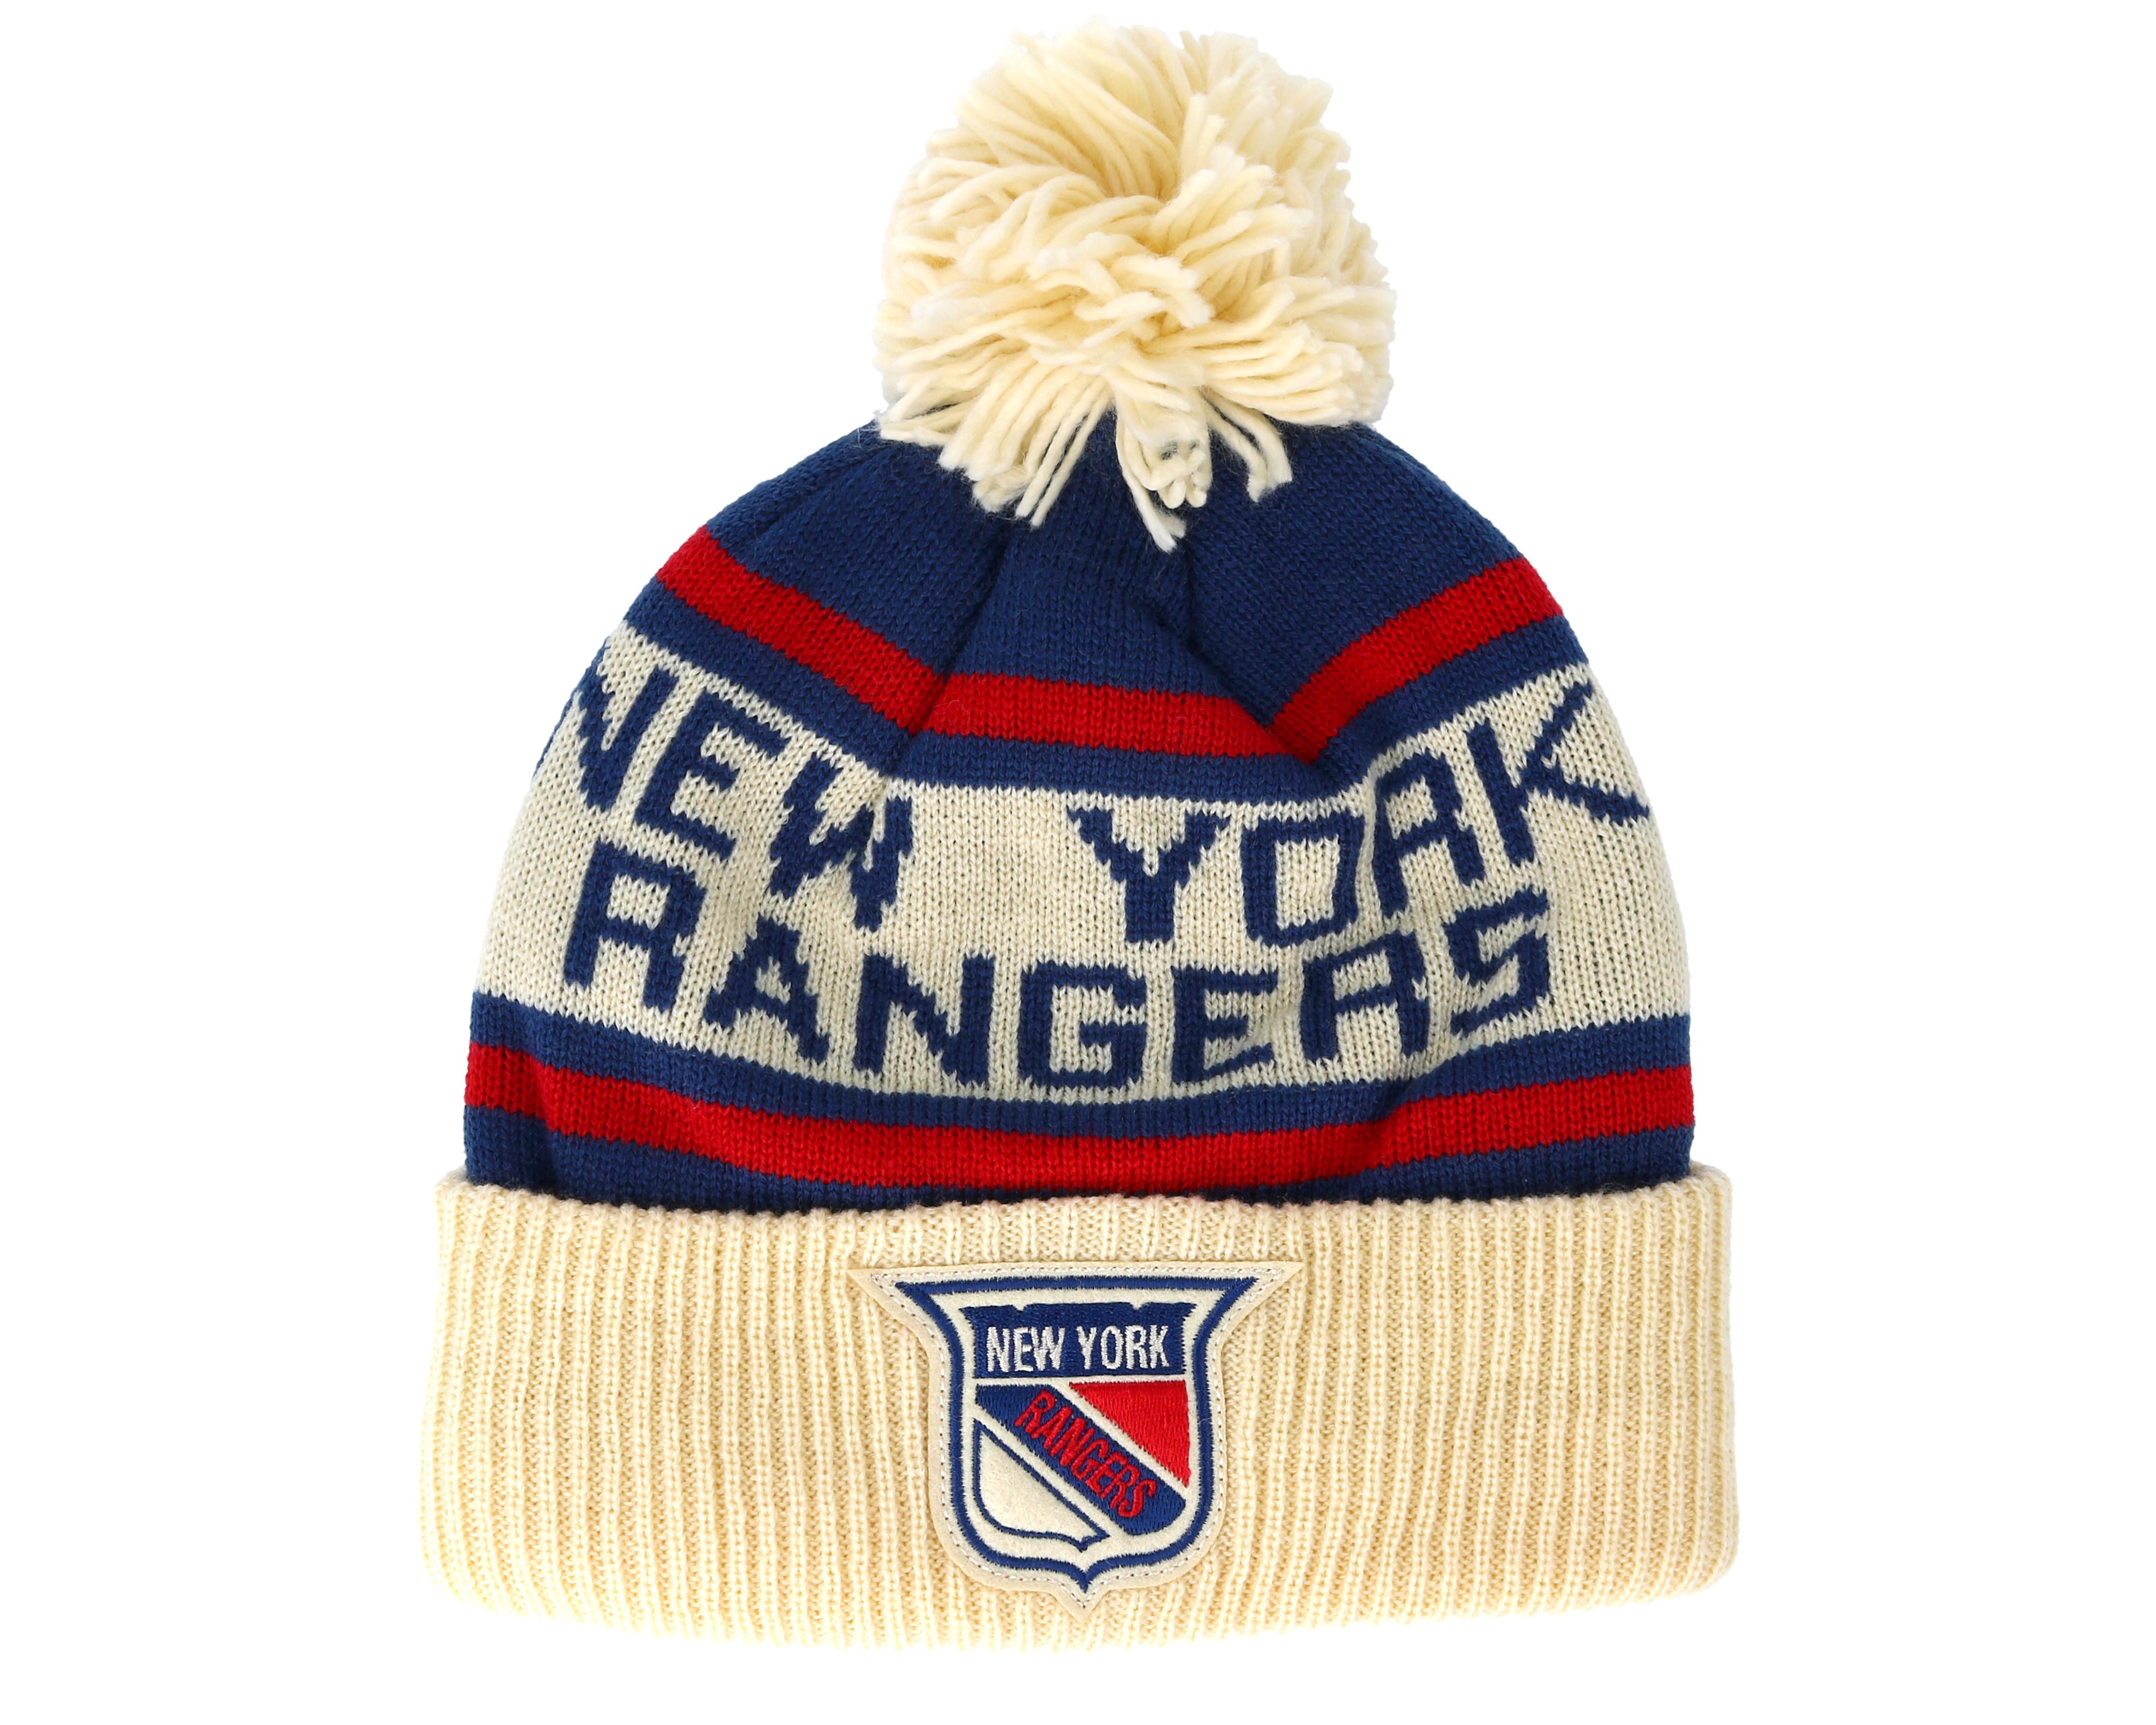 6e59ea6a7 closeout new york rangers winter hat 6273a 63efa